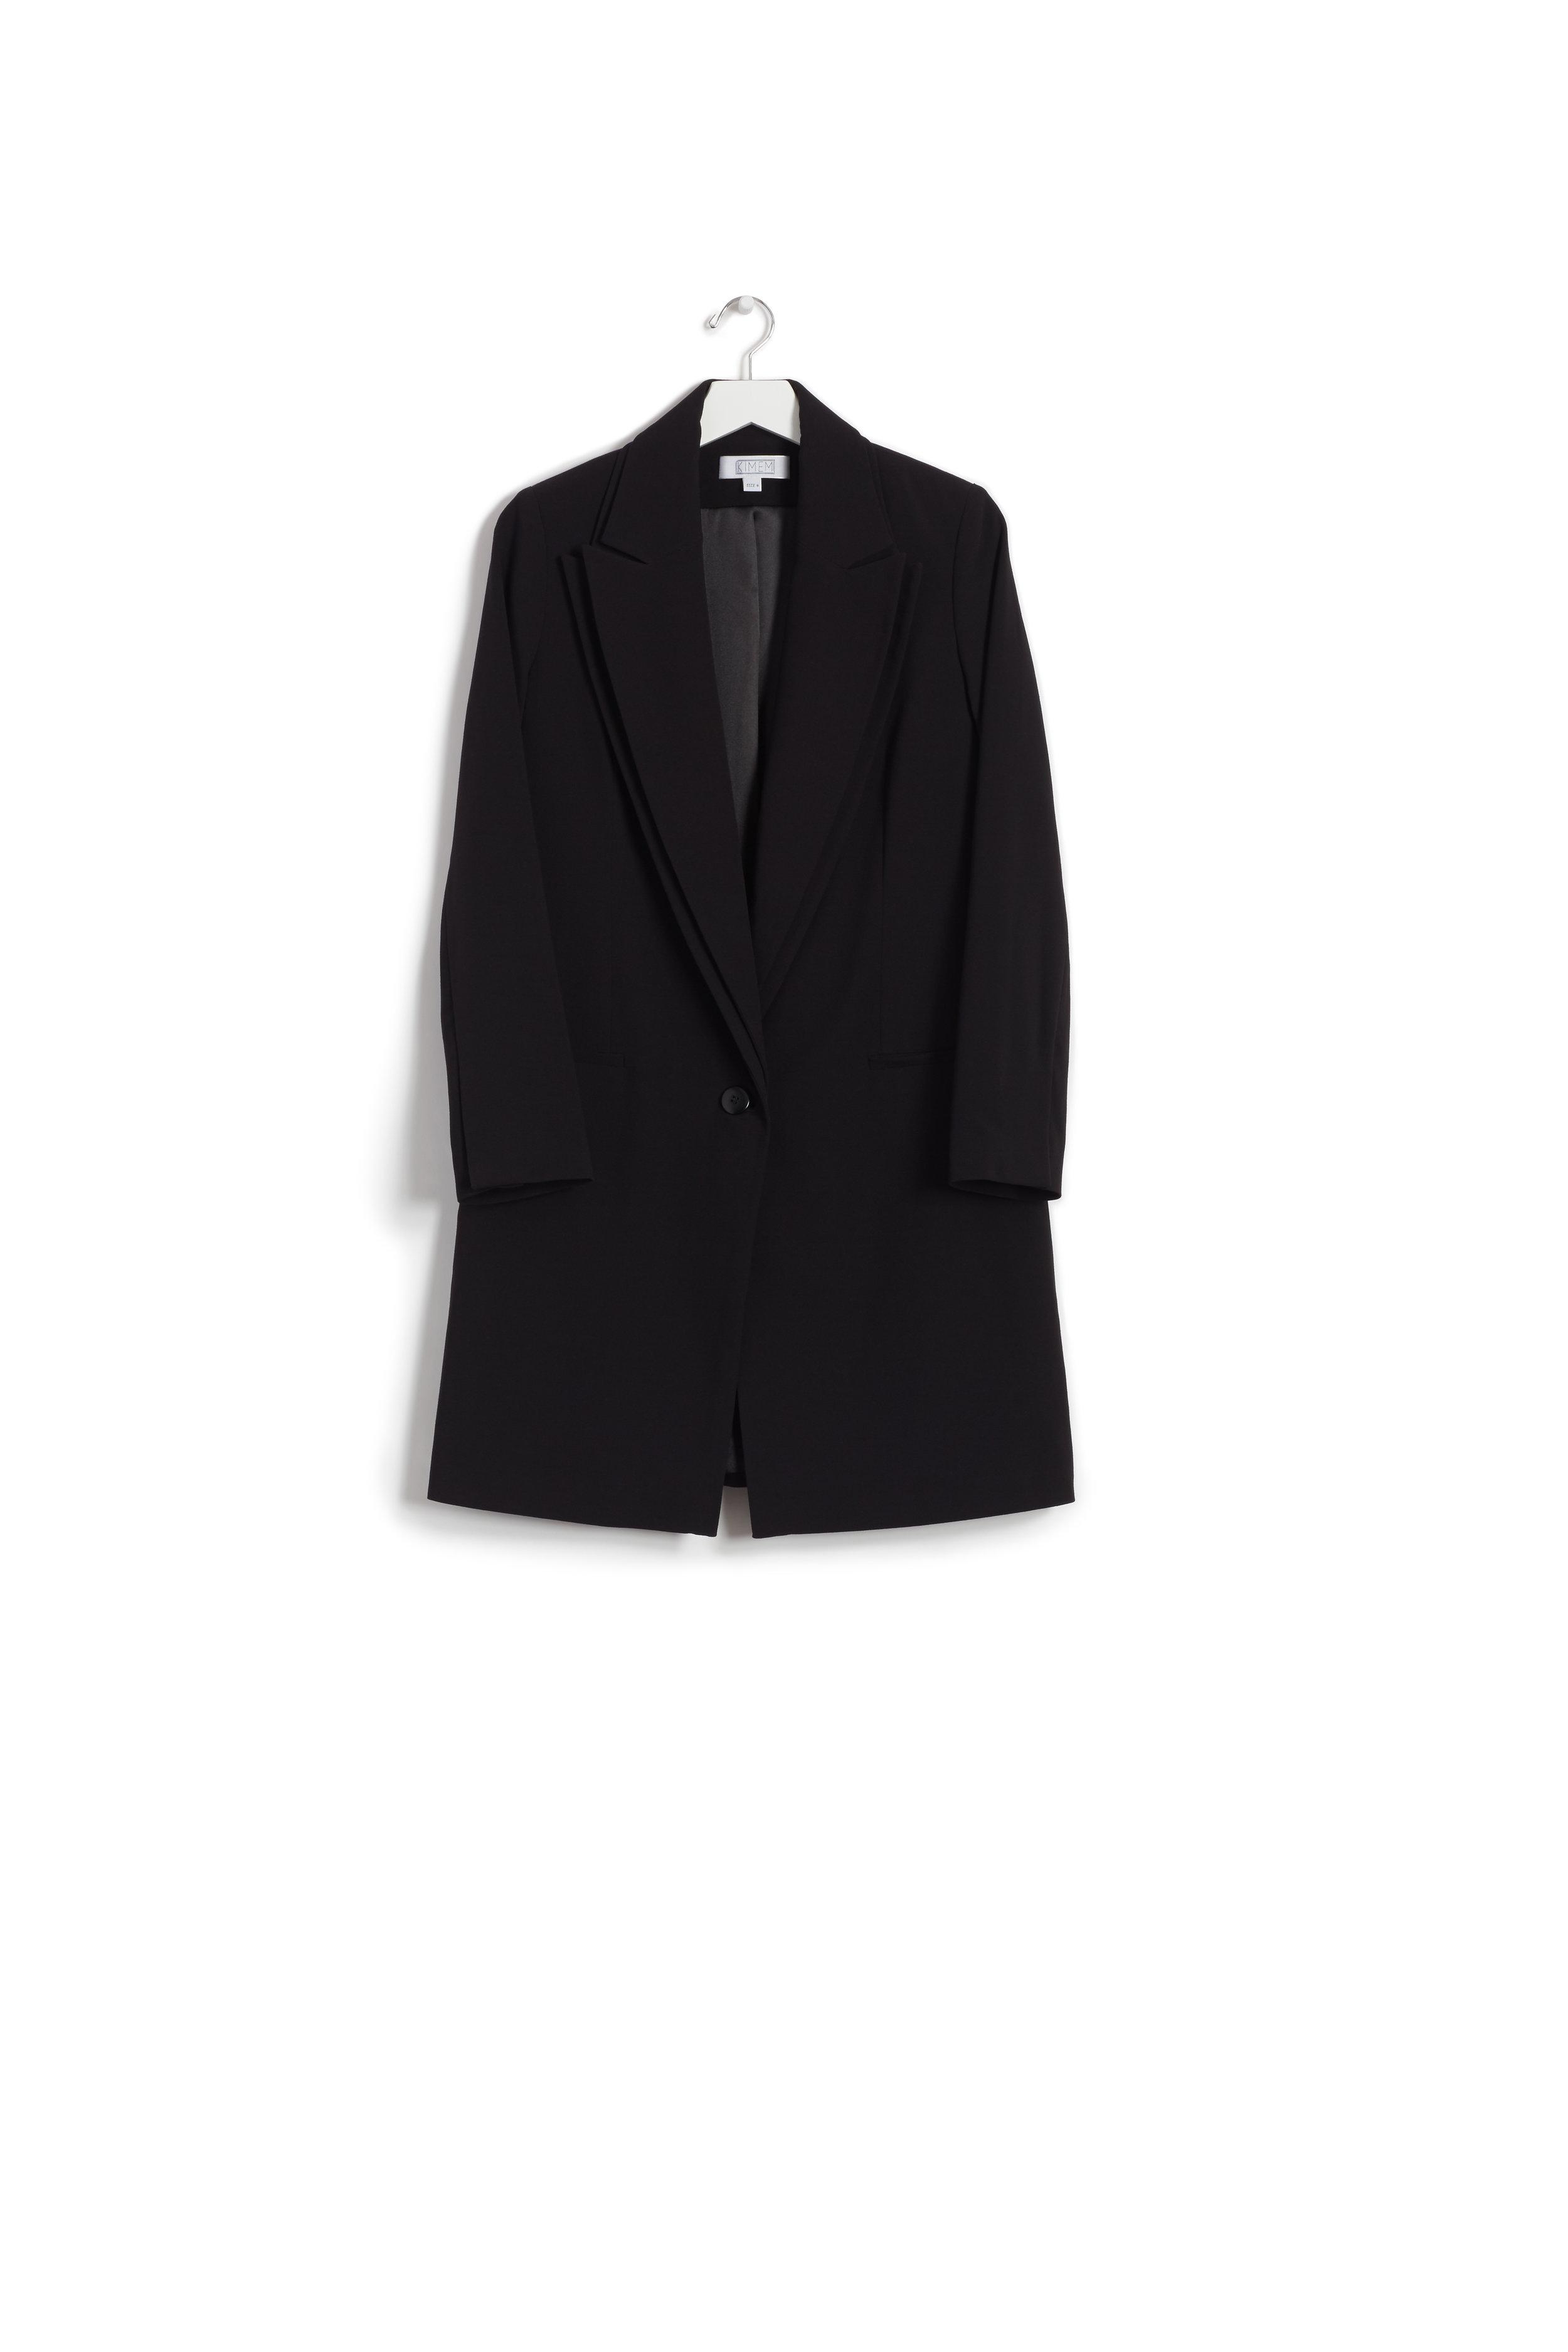 kimem-diana-oversized-jacket-black_0215-v1-FINAL.jpg